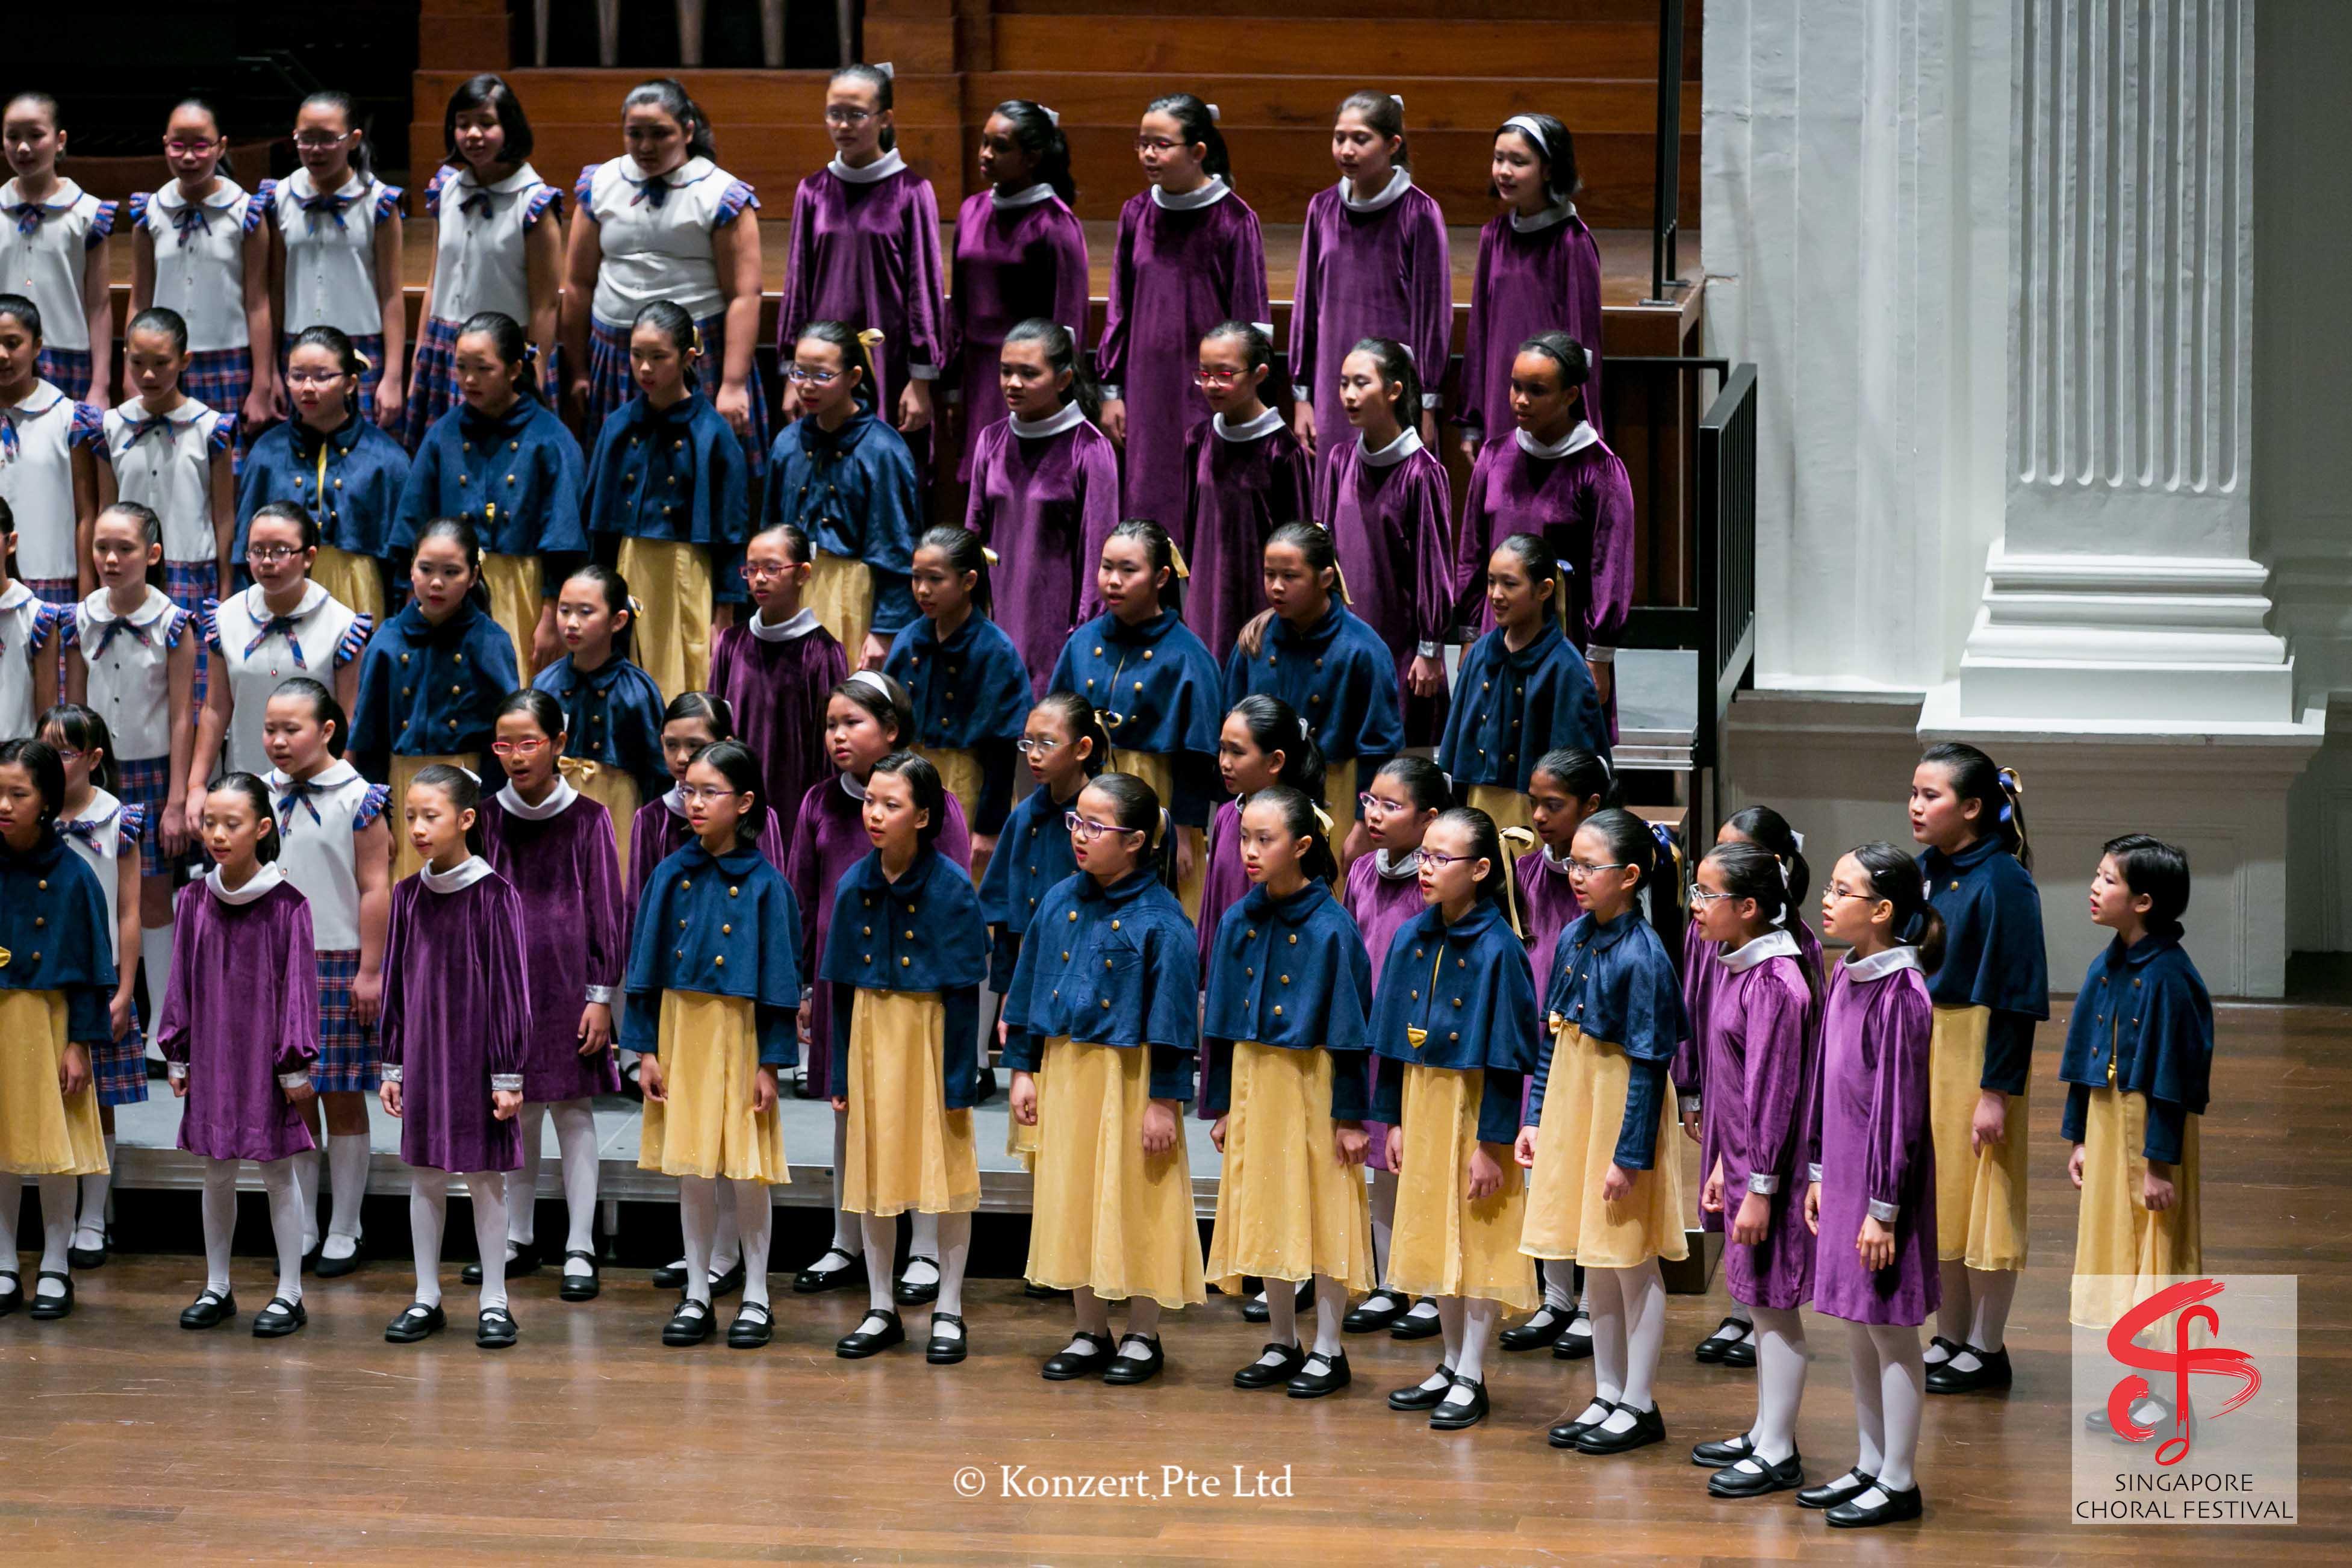 Singapore Choral Festival 8-8-15 (186).jpg